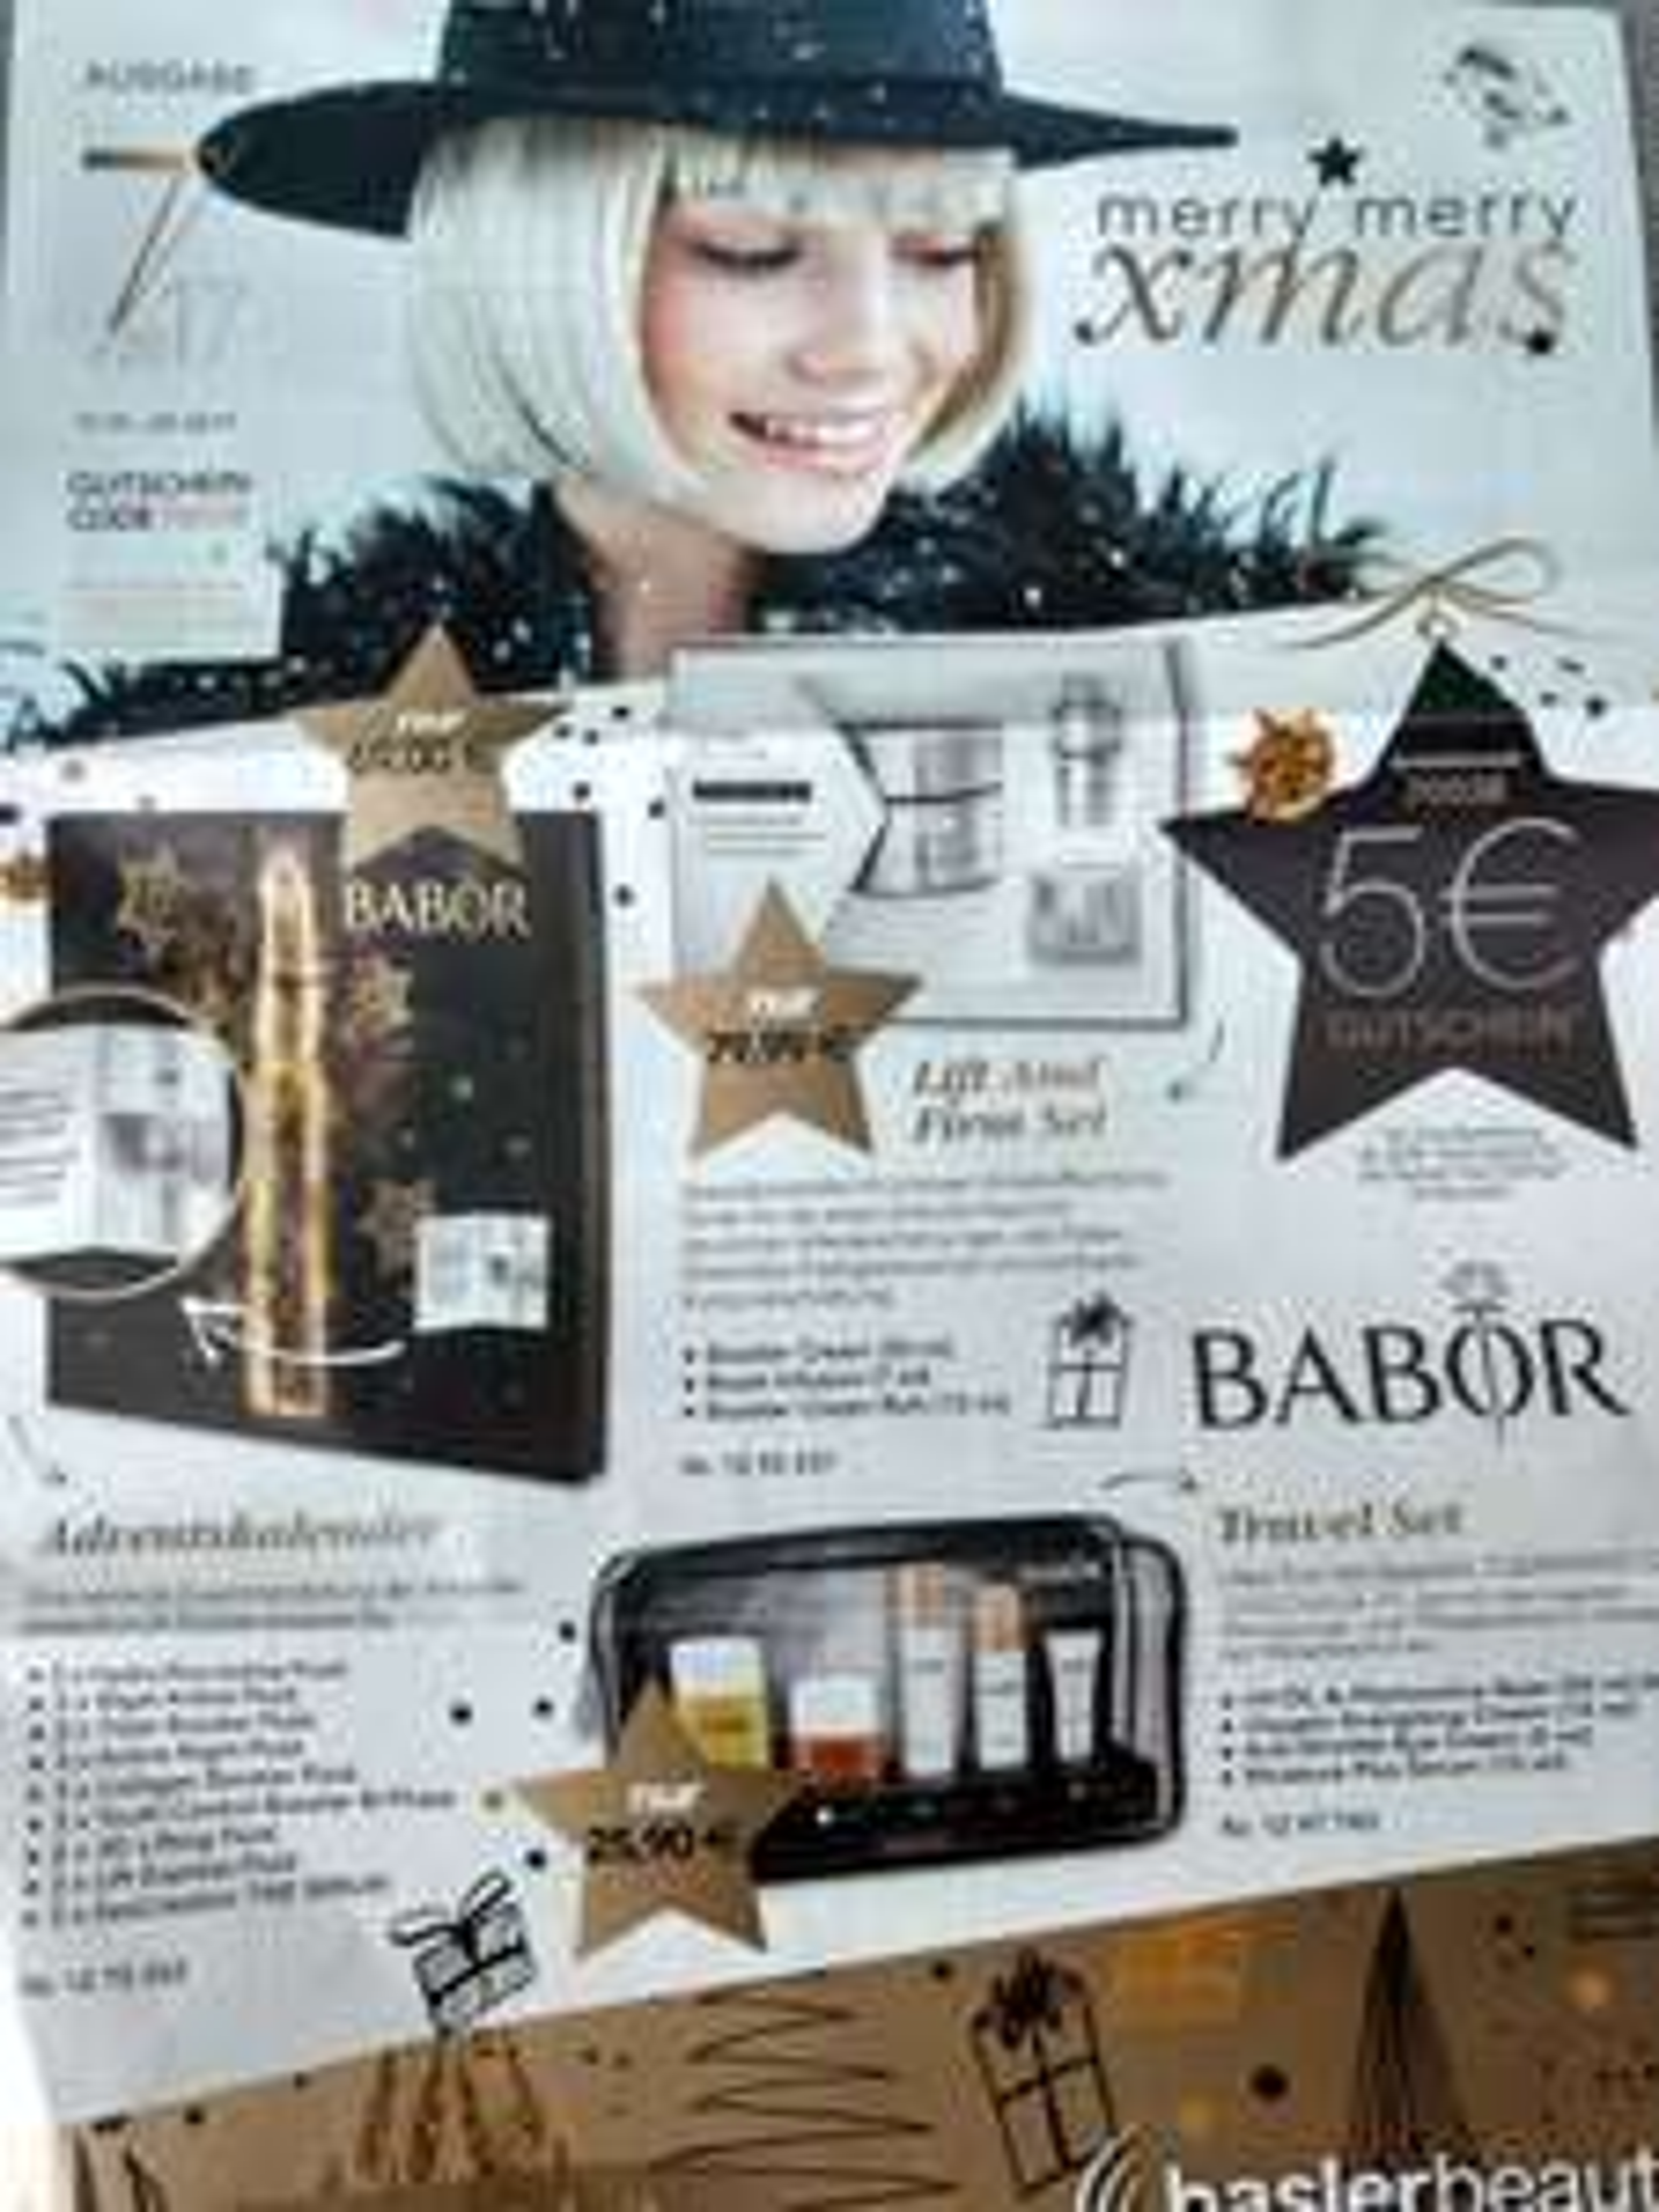 Basler Beauty: 5 Euro Rabatt ab 20 MBW